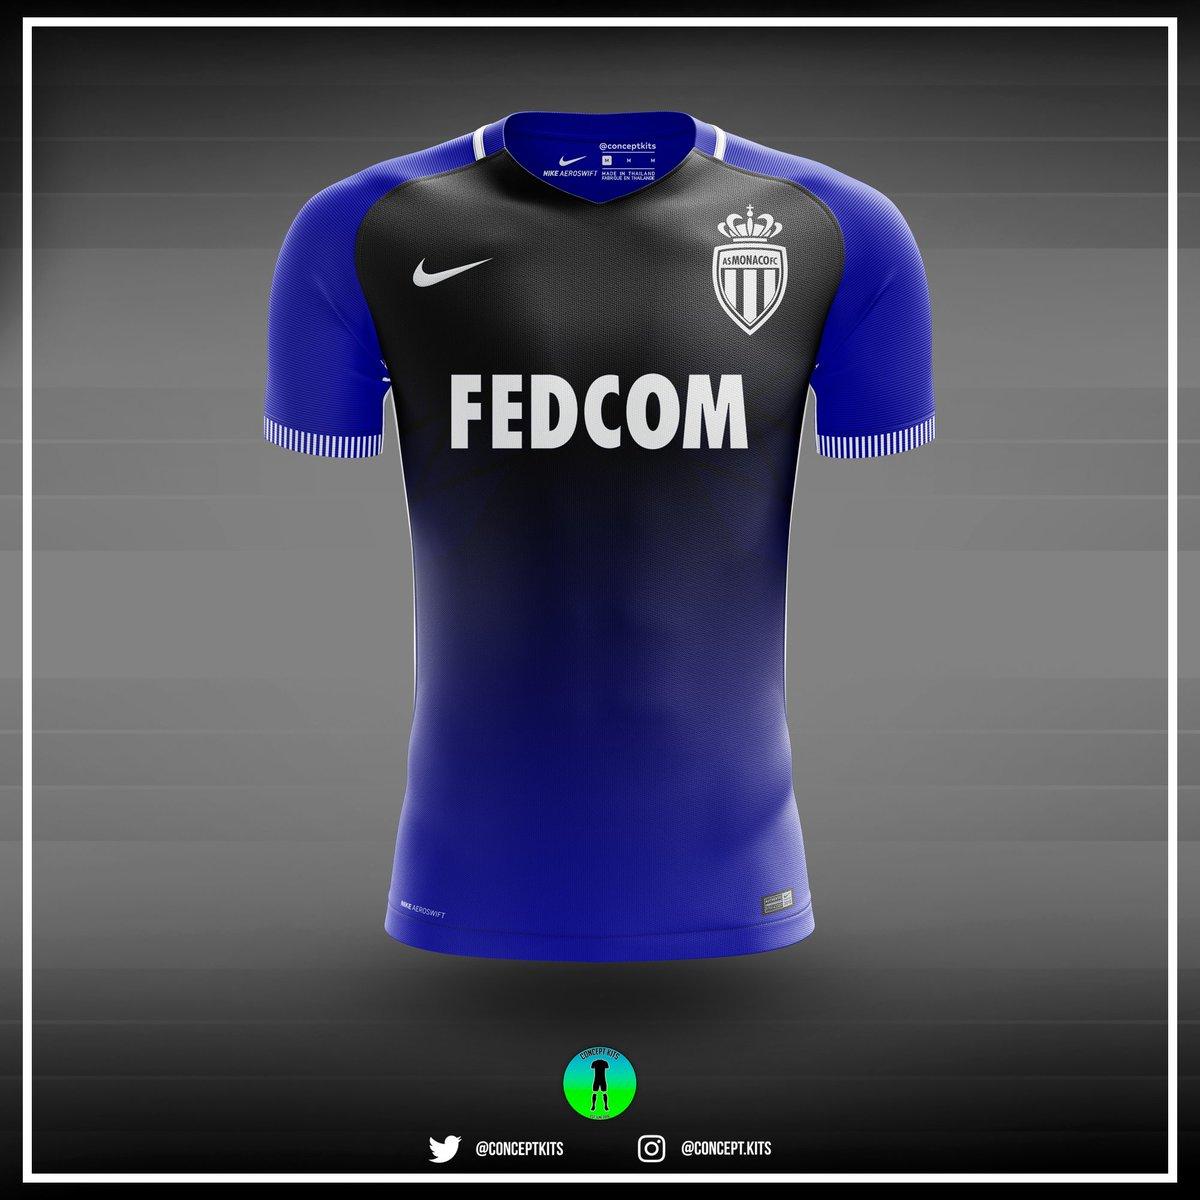 AS Monaco away kit concept 2017/18 #ASM #Ligue1 #ASMonaco #Monaco #Mbappe #Falcao #Jardin #France #nike #aeroswift #nikeaeroswift #newkit<br>http://pic.twitter.com/u0fjWG5lqg